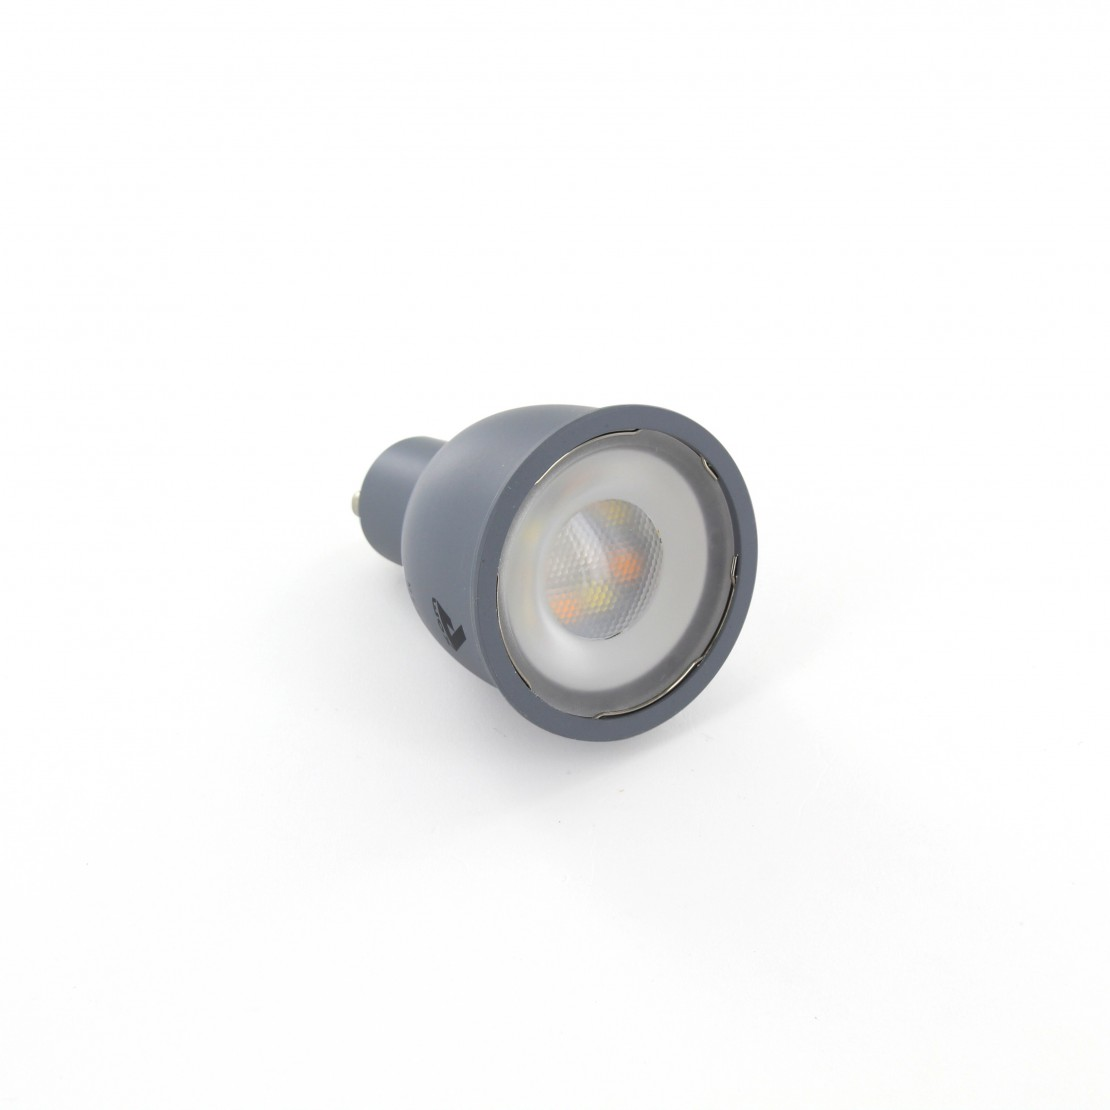 SmartLIGHT - GU10 colour bulb Bluetooth Mesh